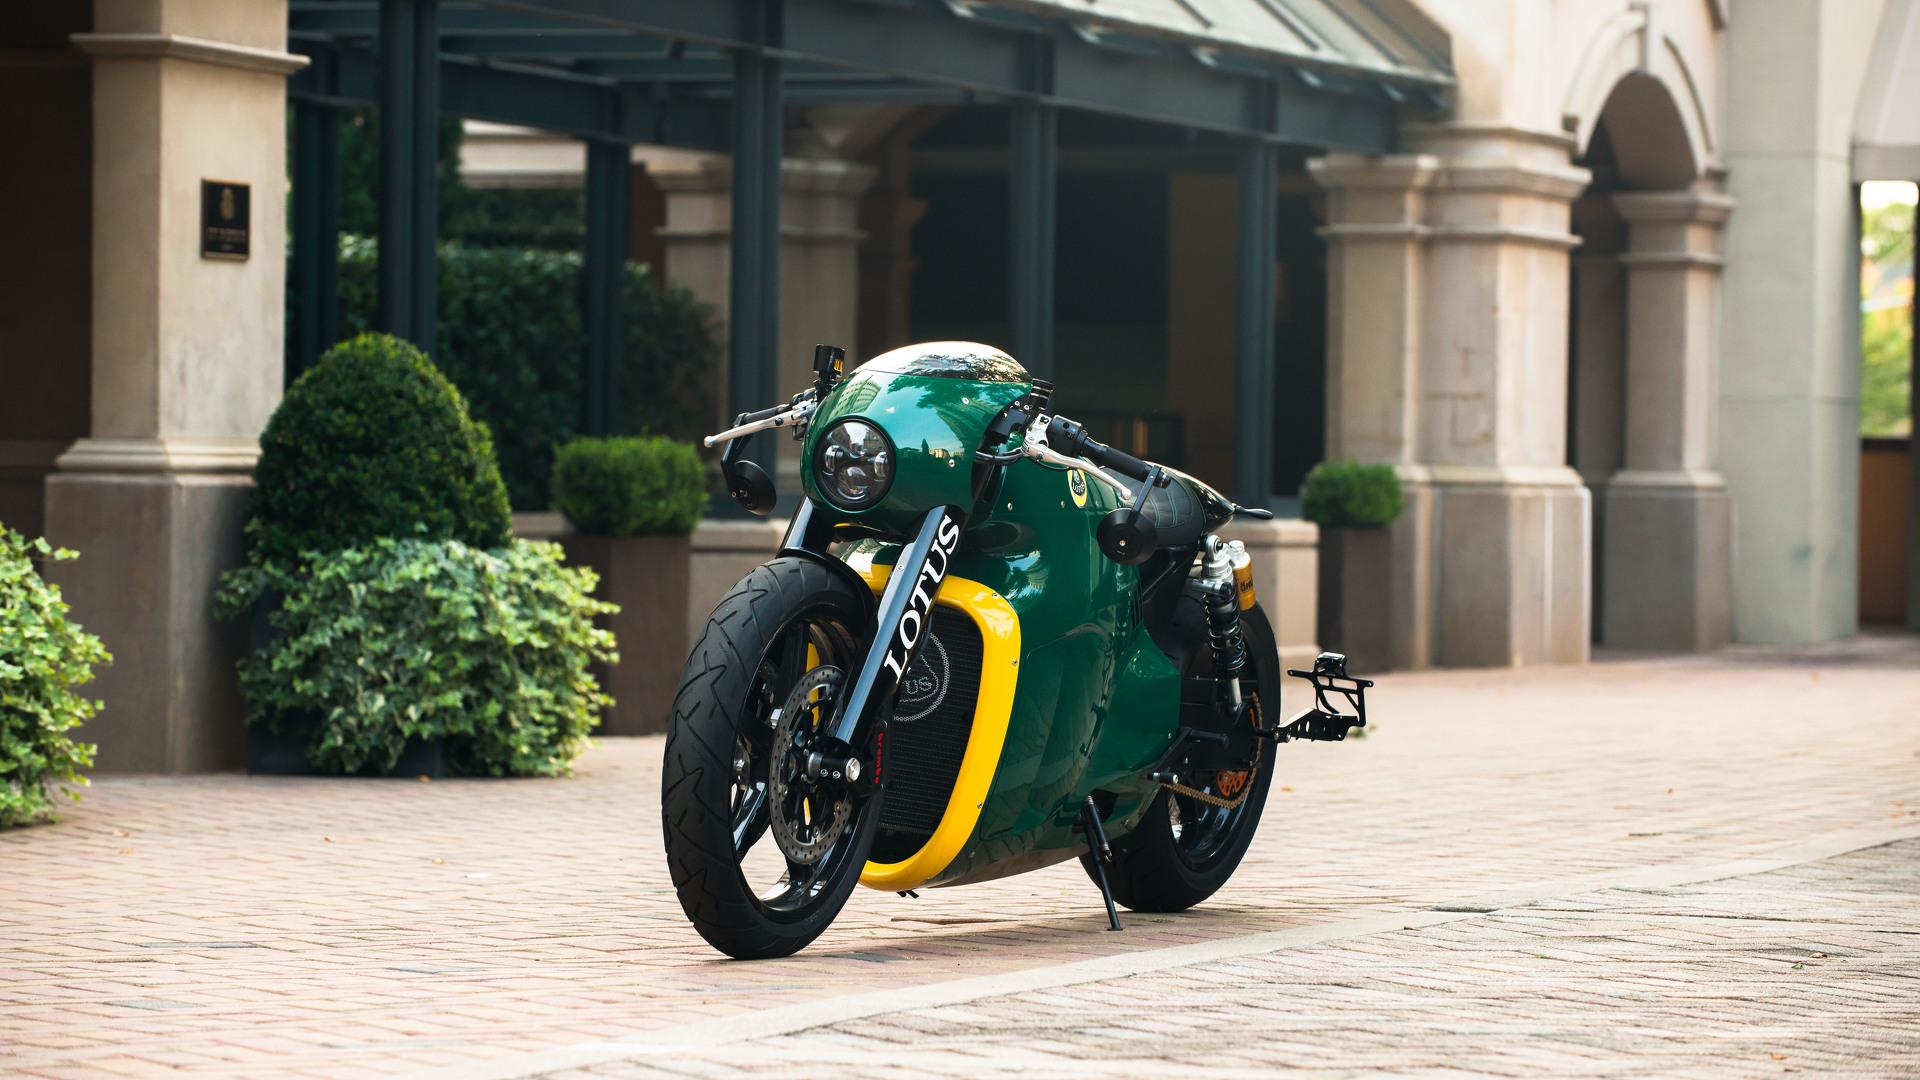 Lotus C 01 Motorcycle By Roborace Designer Daniel Simon